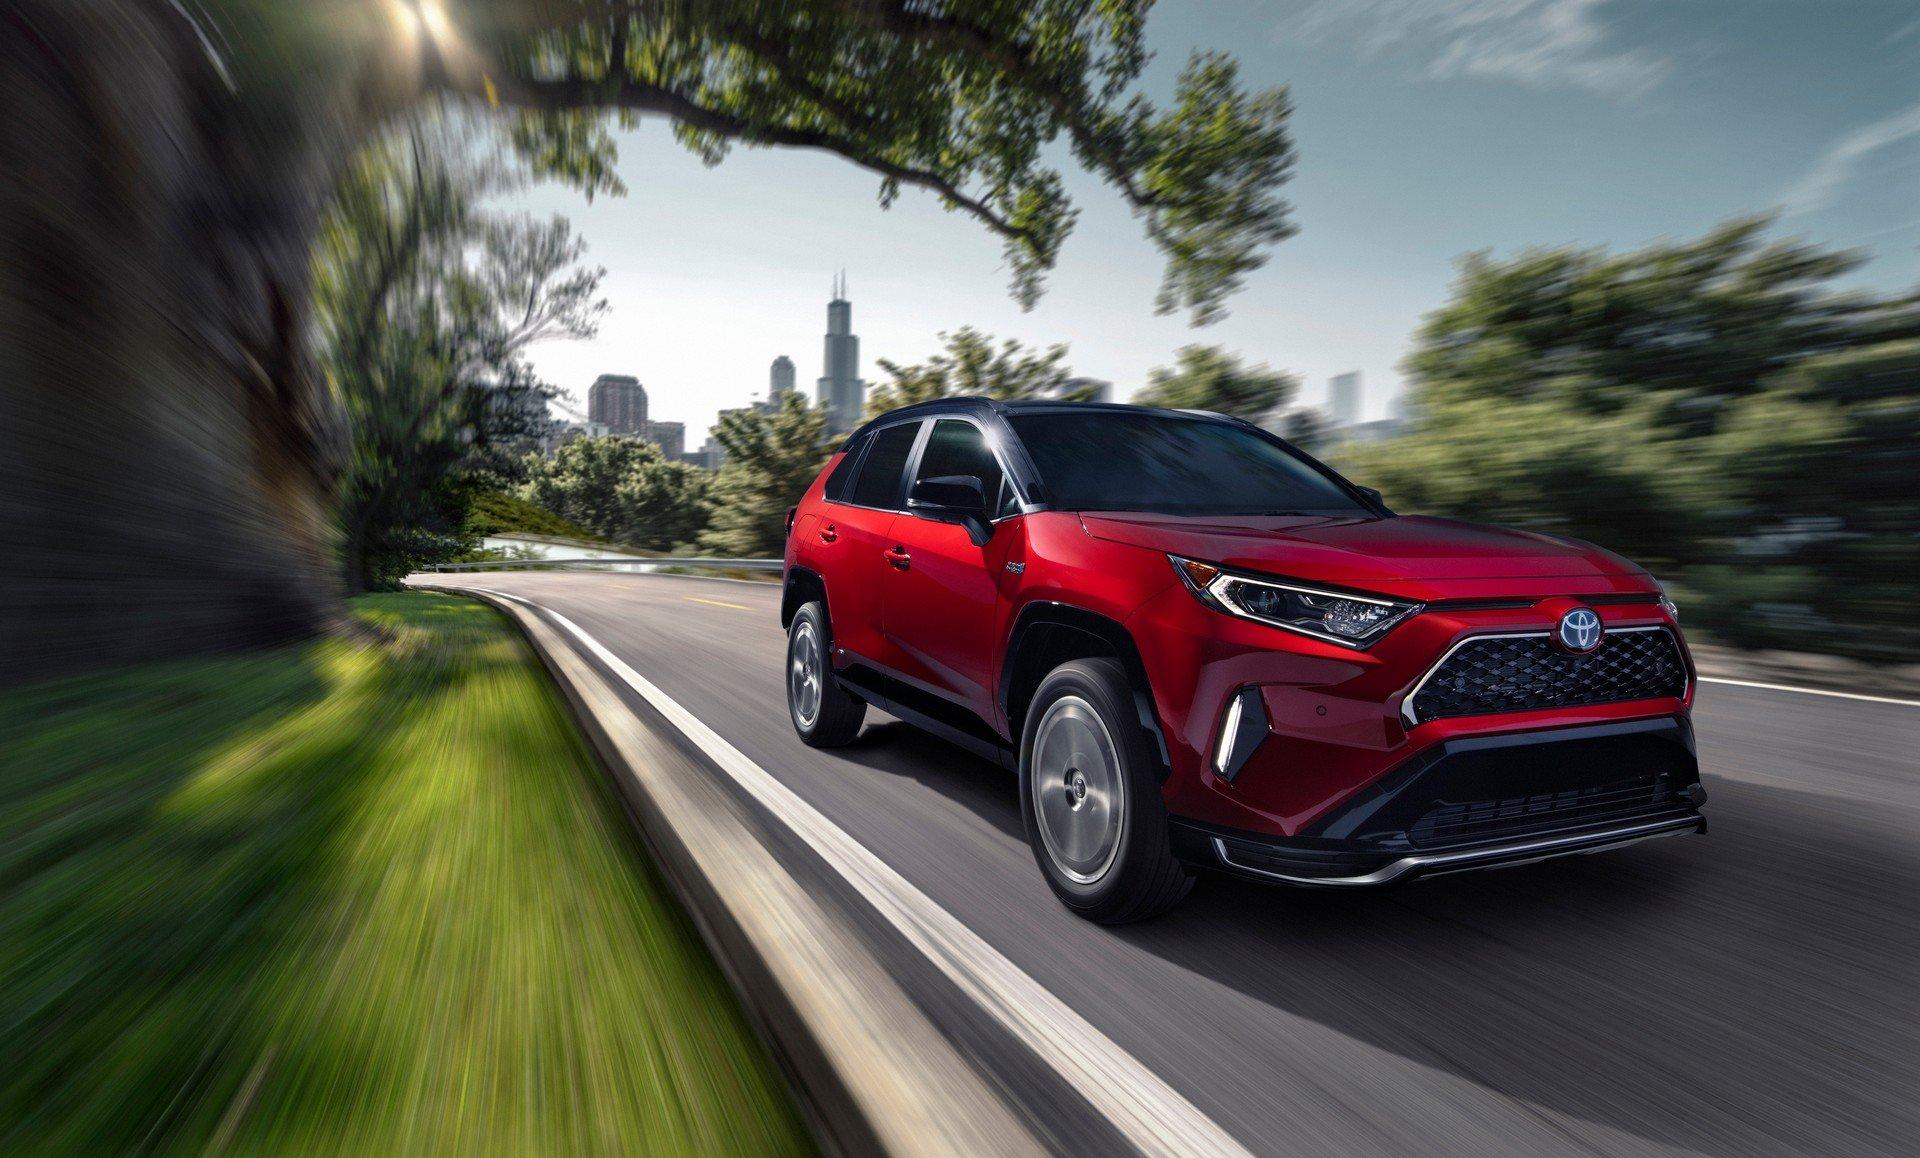 Toyota-RAV4-Plug-in-Hybrid-Prime-2020-5